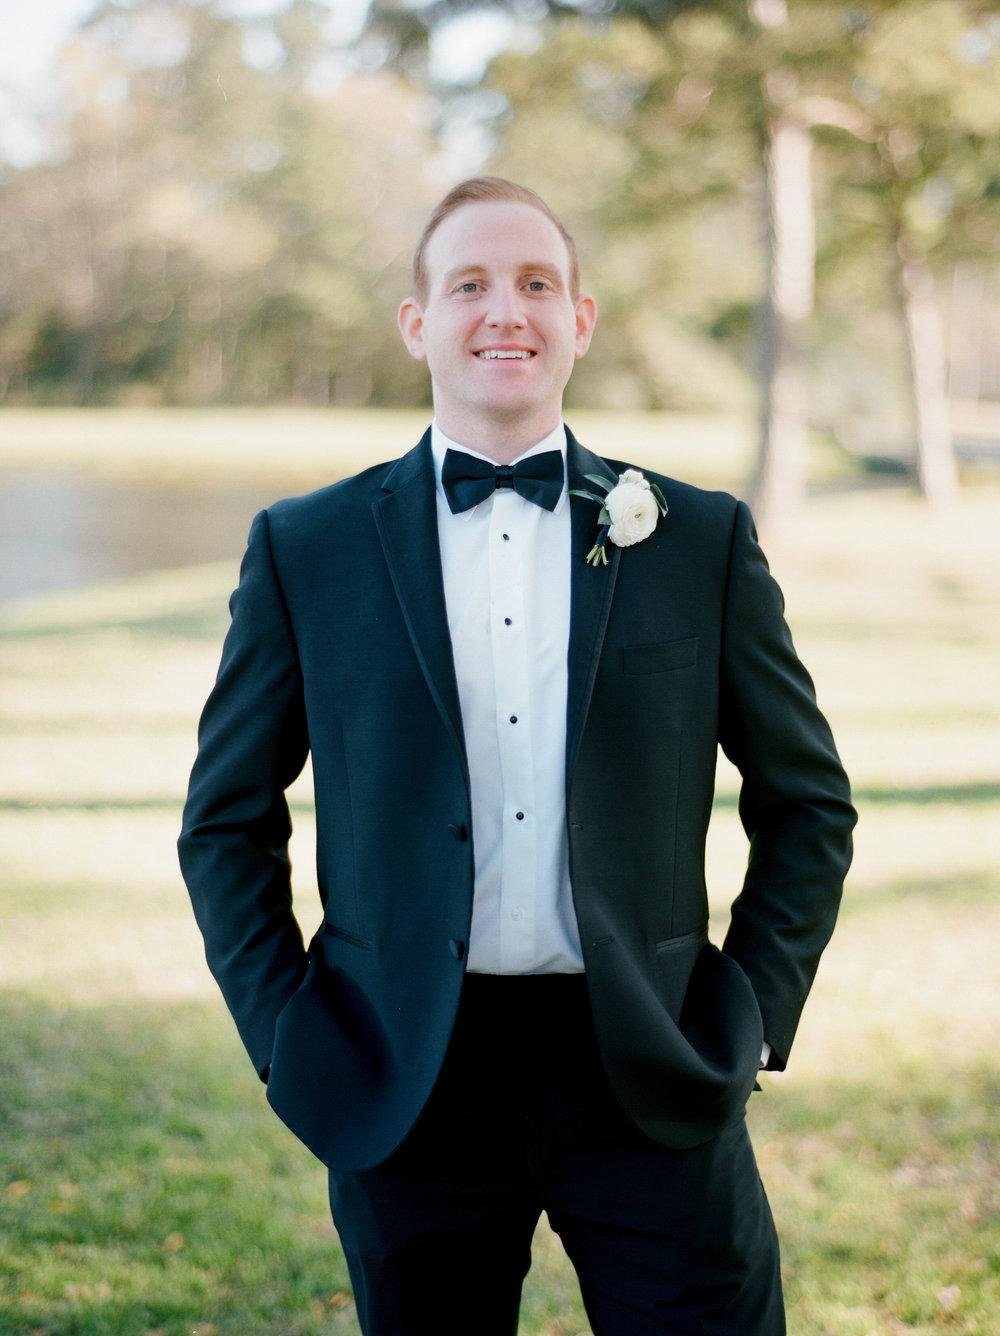 Houston-Wedding-Photographer-Style-Me-Pretty-St-Anne-Catholic-Church-Wedding-The-Woodlands-Country-Club-Palmer-Course-Austin-Wedding-photographer-fine-art-film-15.jpg